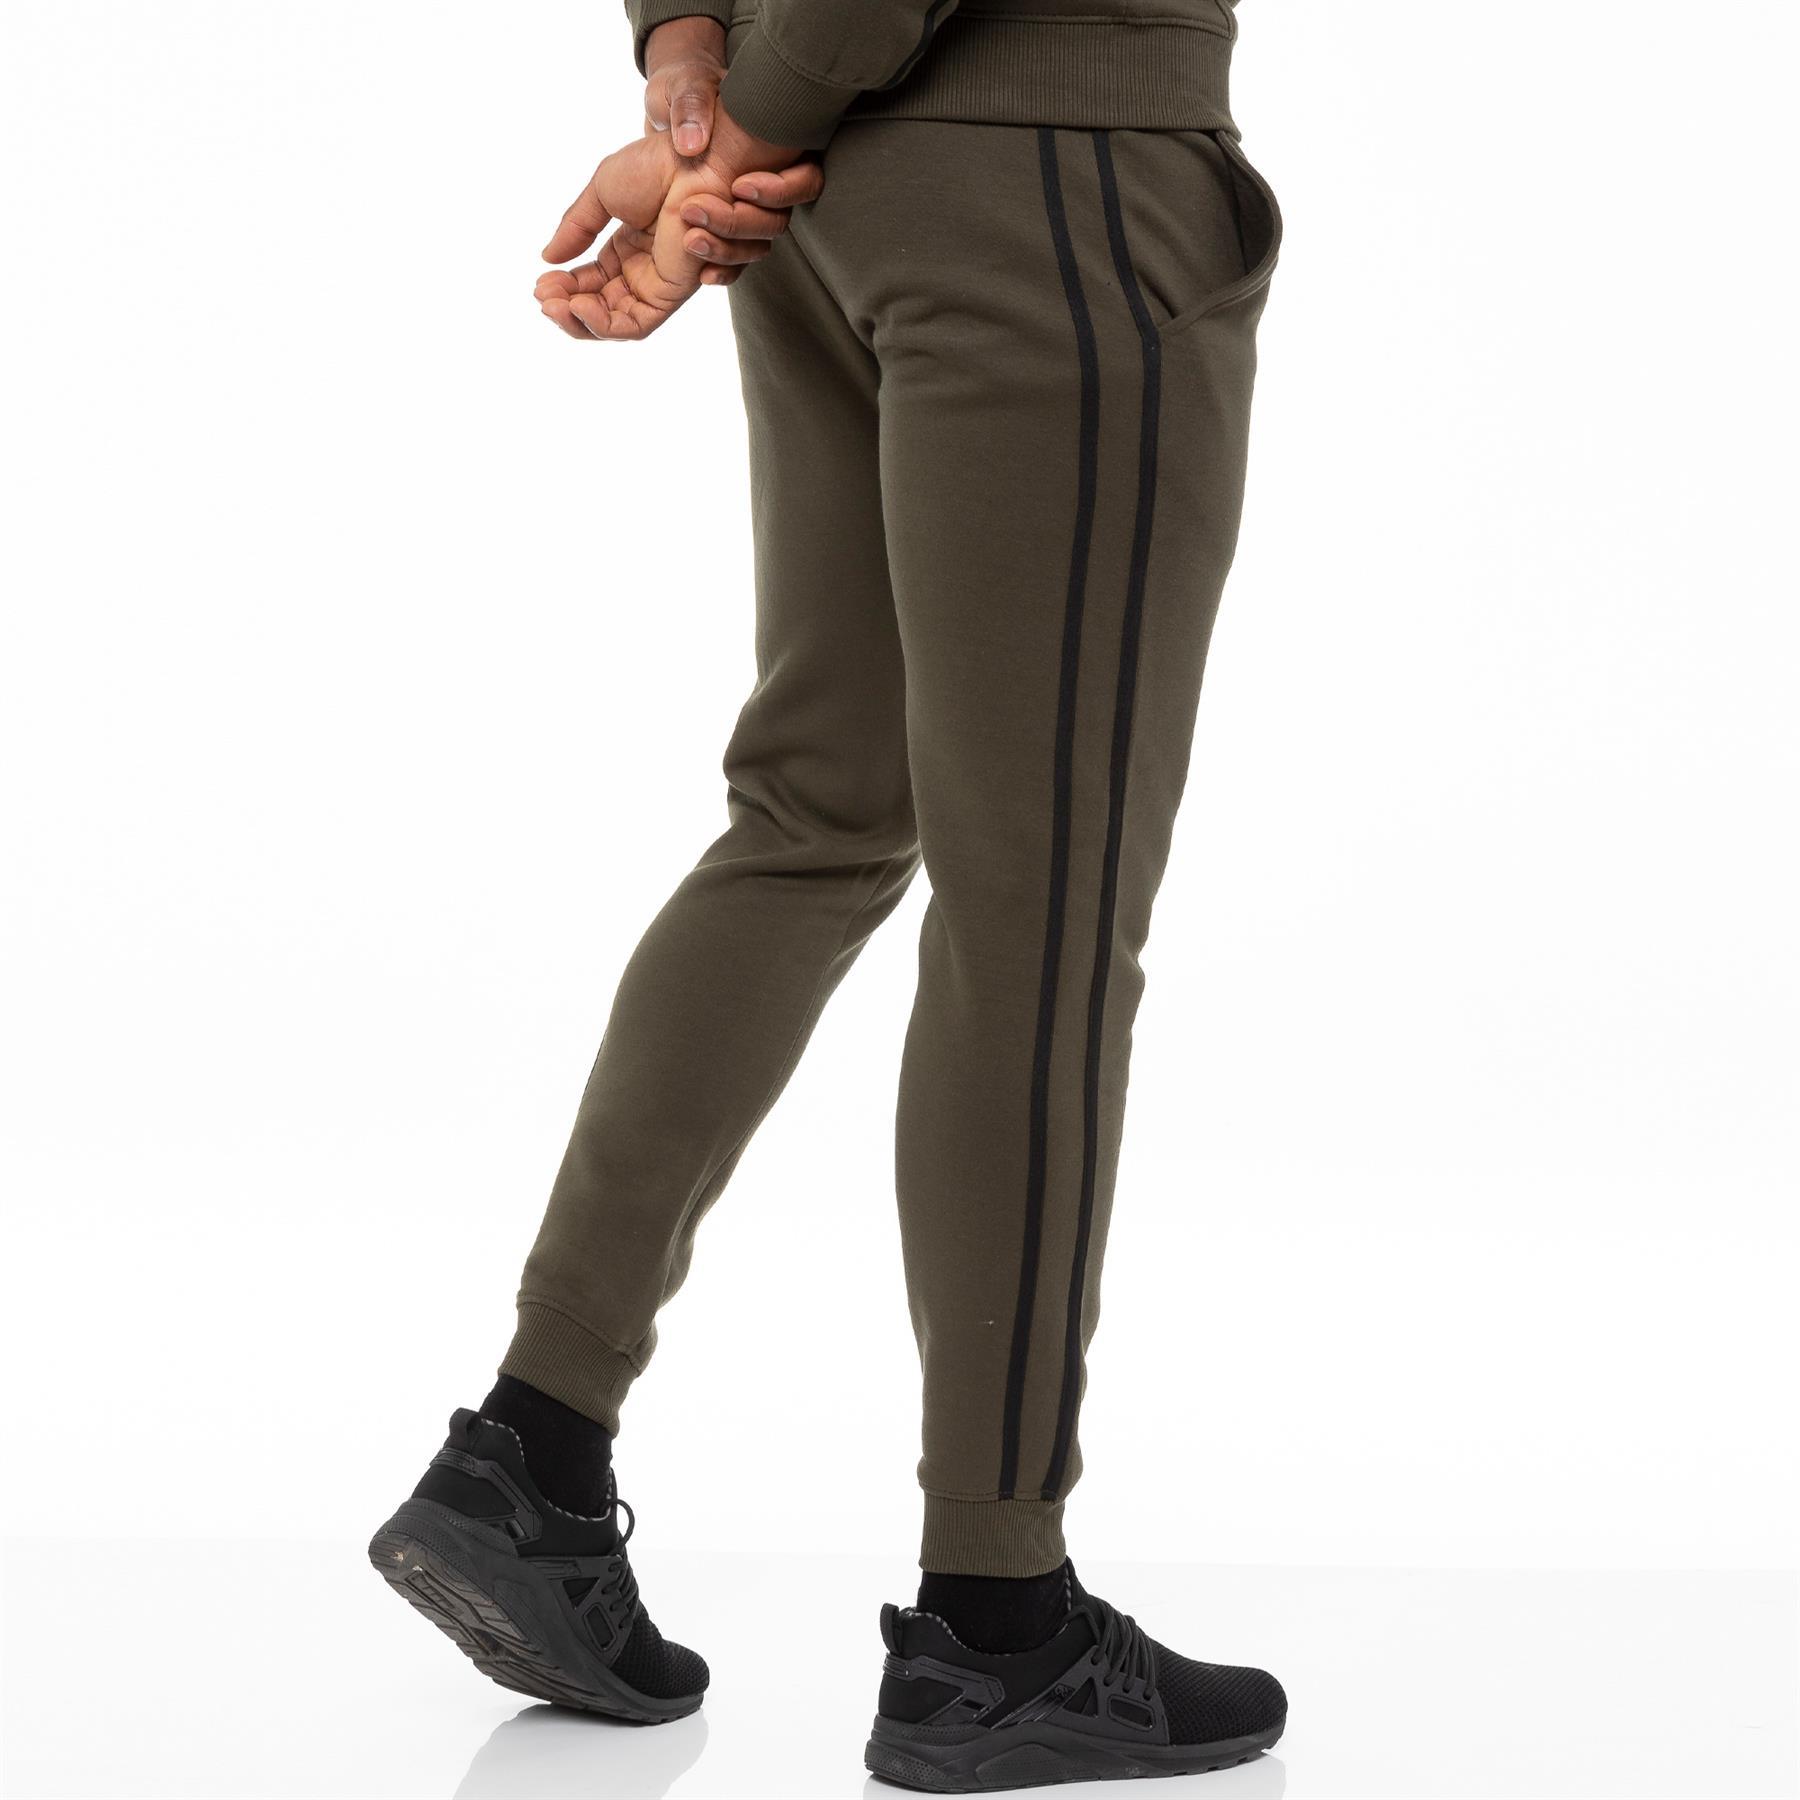 Enzo Mens Joggers Striped Tracksuit Jogging Bottoms Gym Sports Fleece Sweatpants